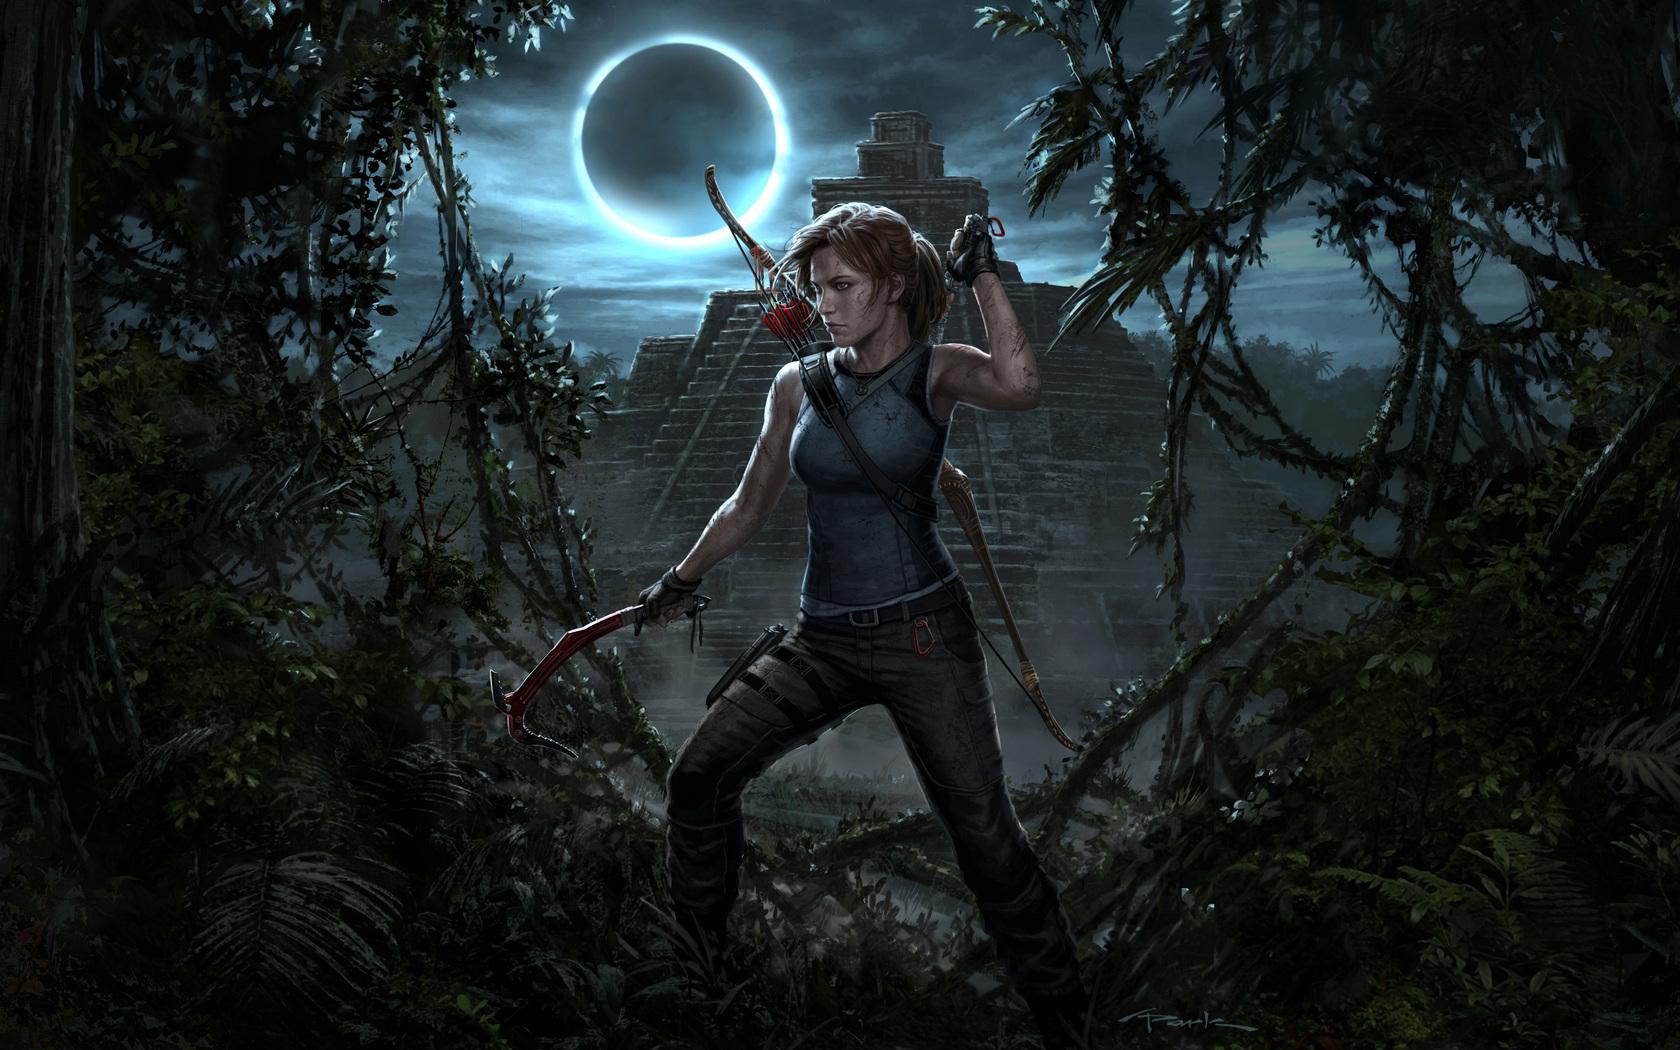 1680x1050 Lara Croft Shadow Of The Tomb Raider 4k 1680x1050